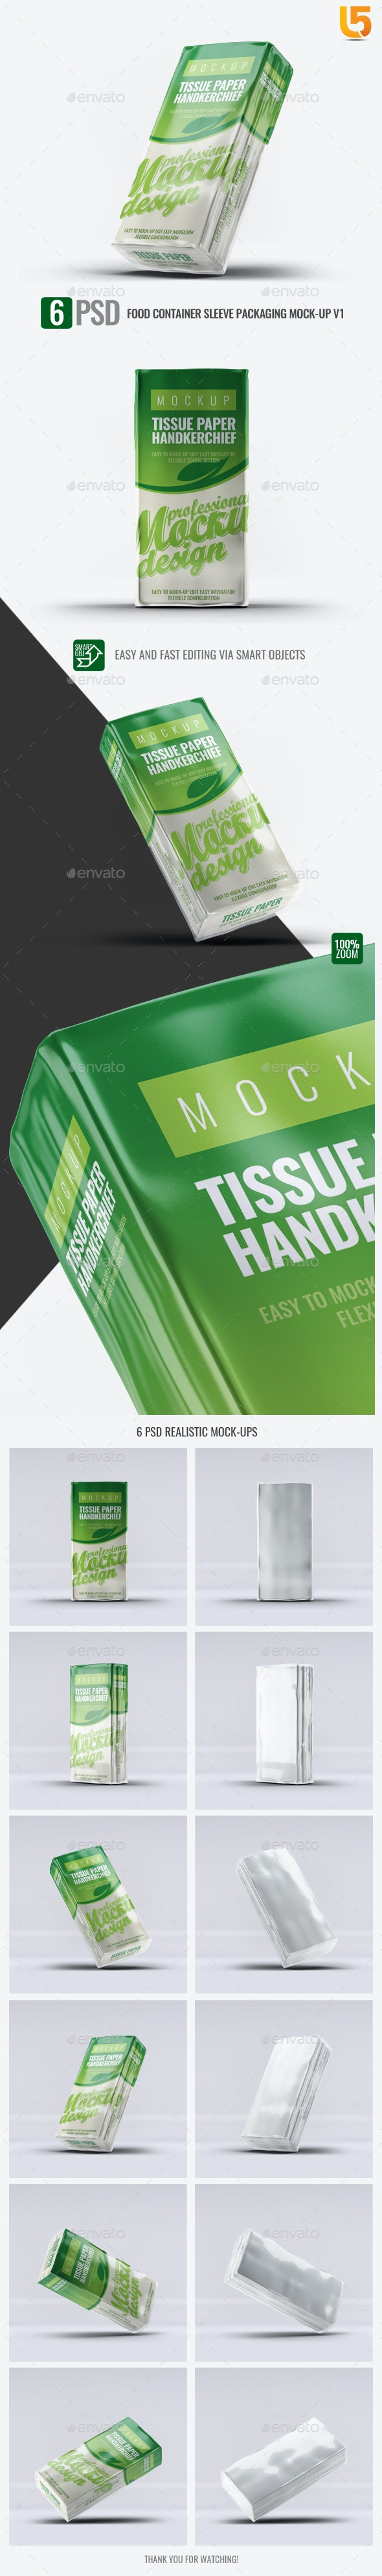 Tissue Paper Handkerchief Mock-Up - Miscellaneous Product Mock-Ups